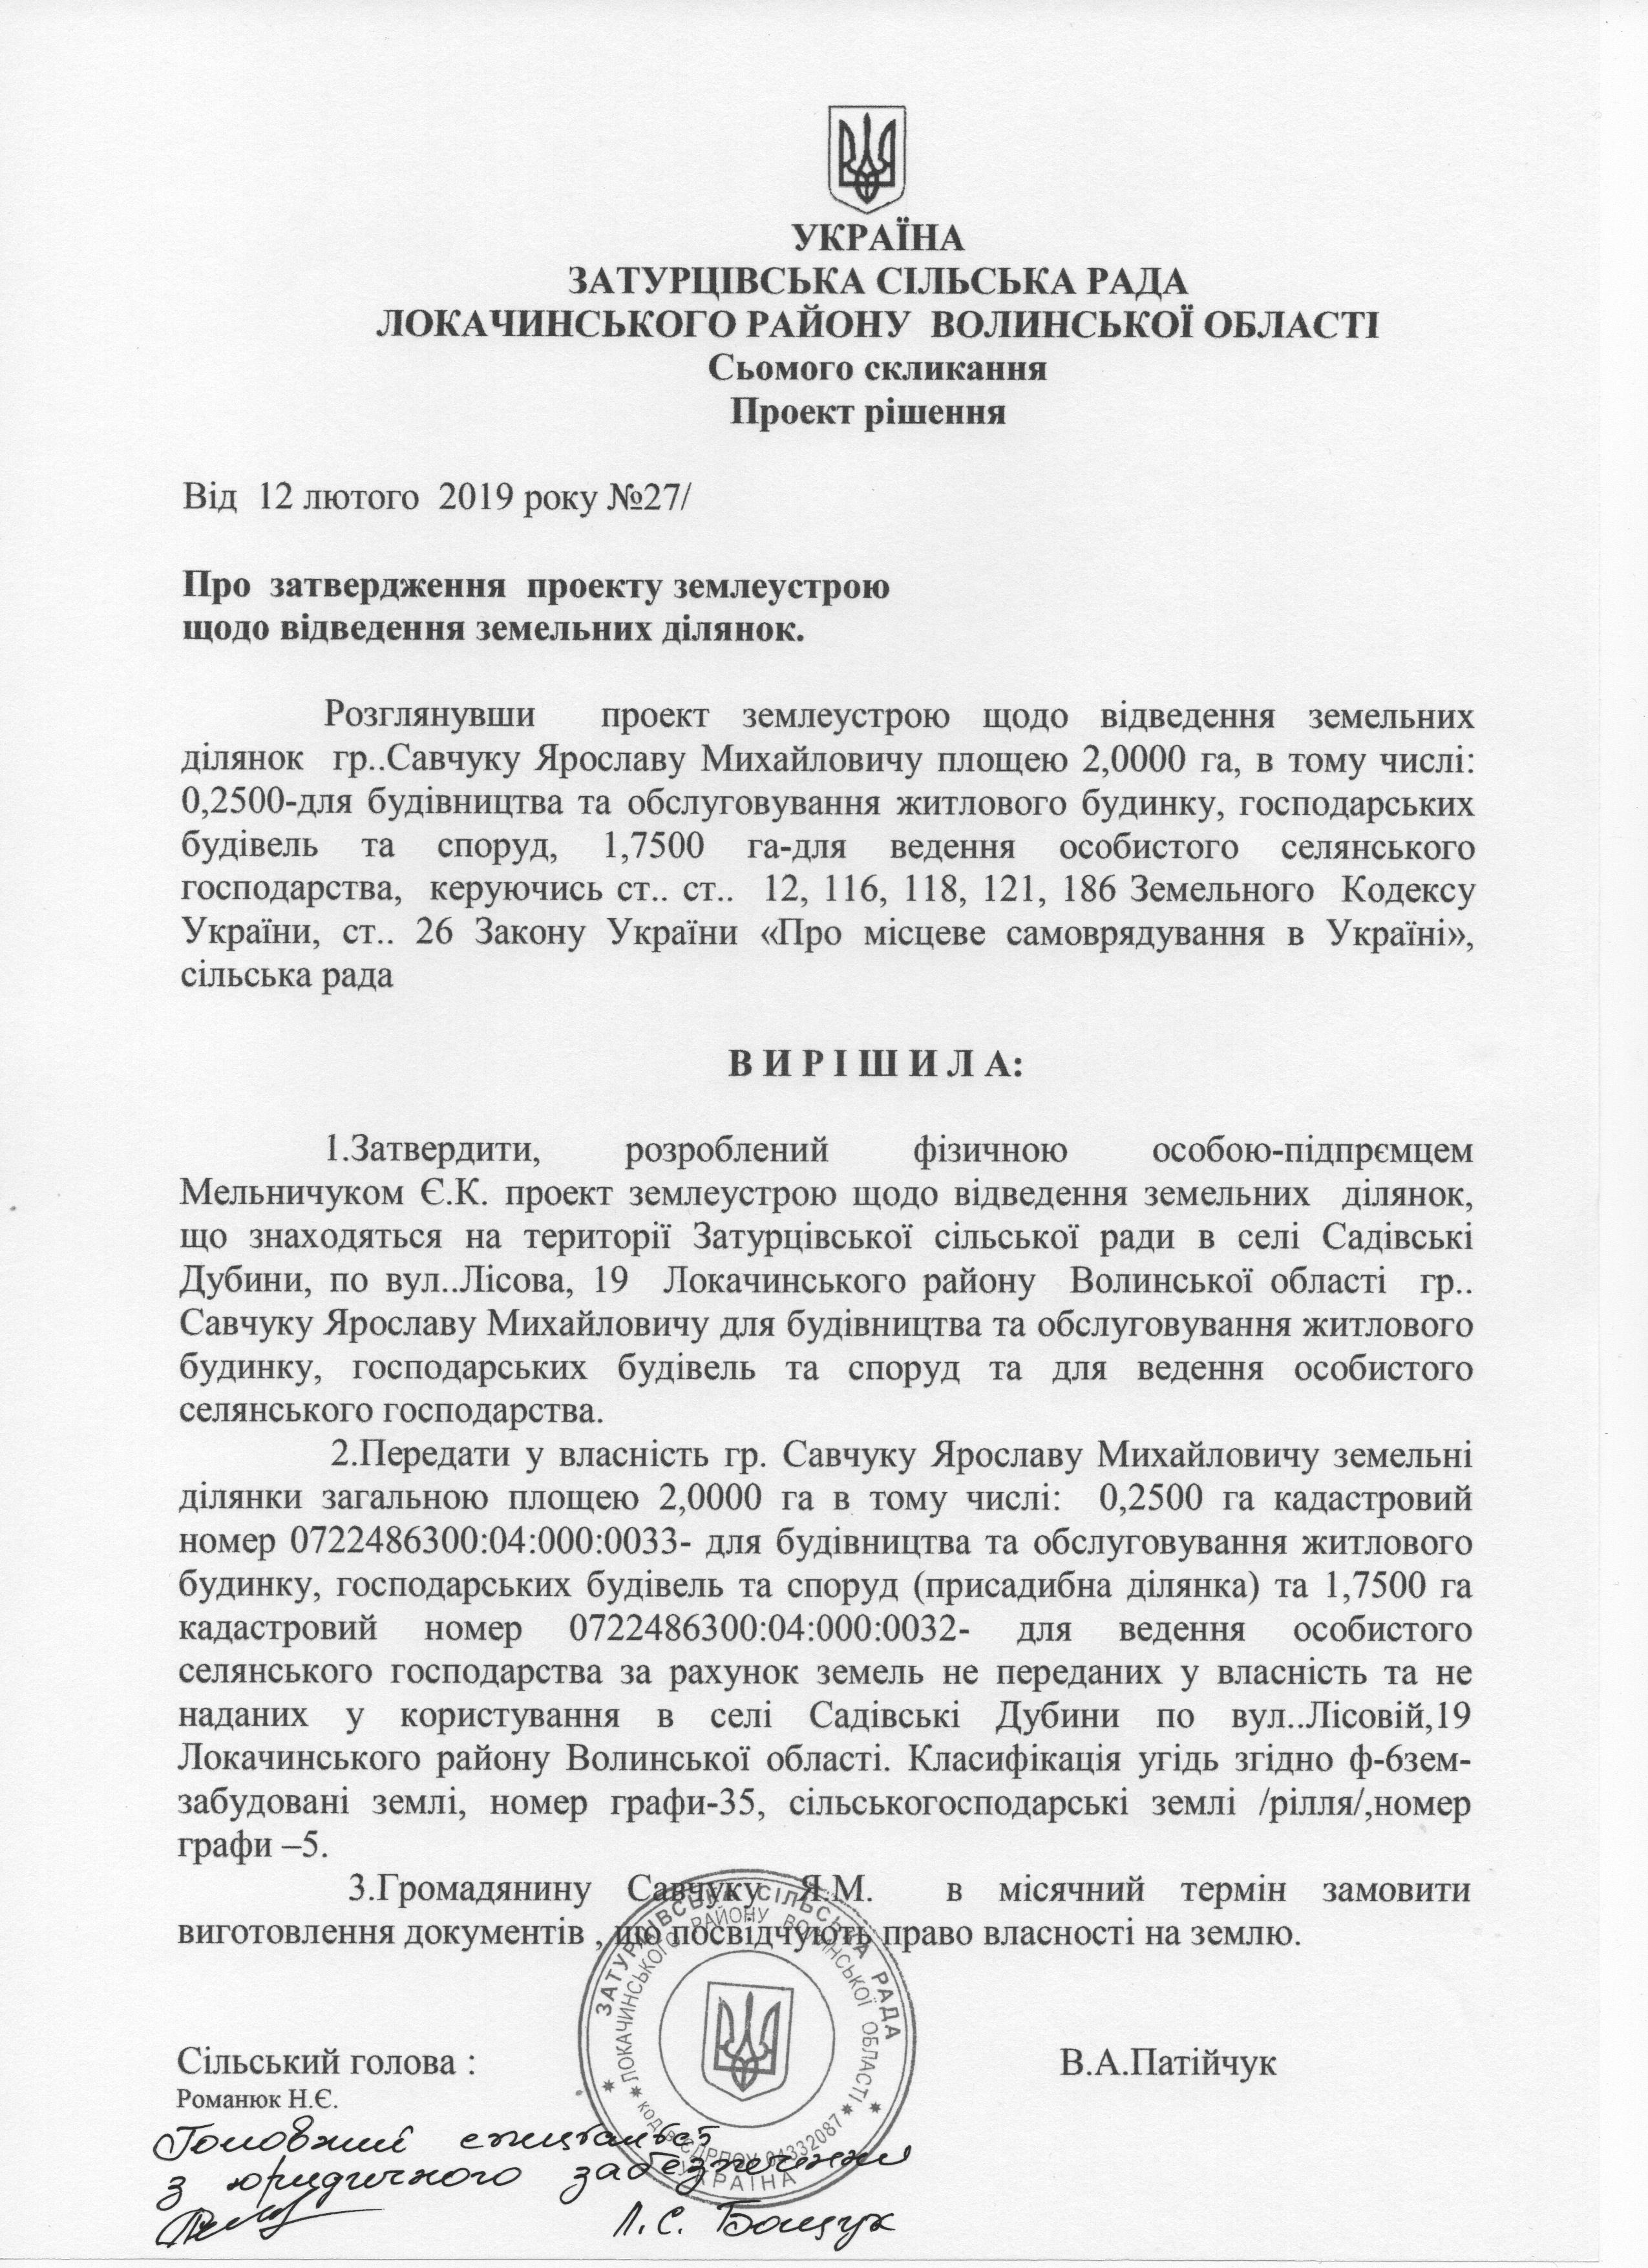 Савчук Я.М.